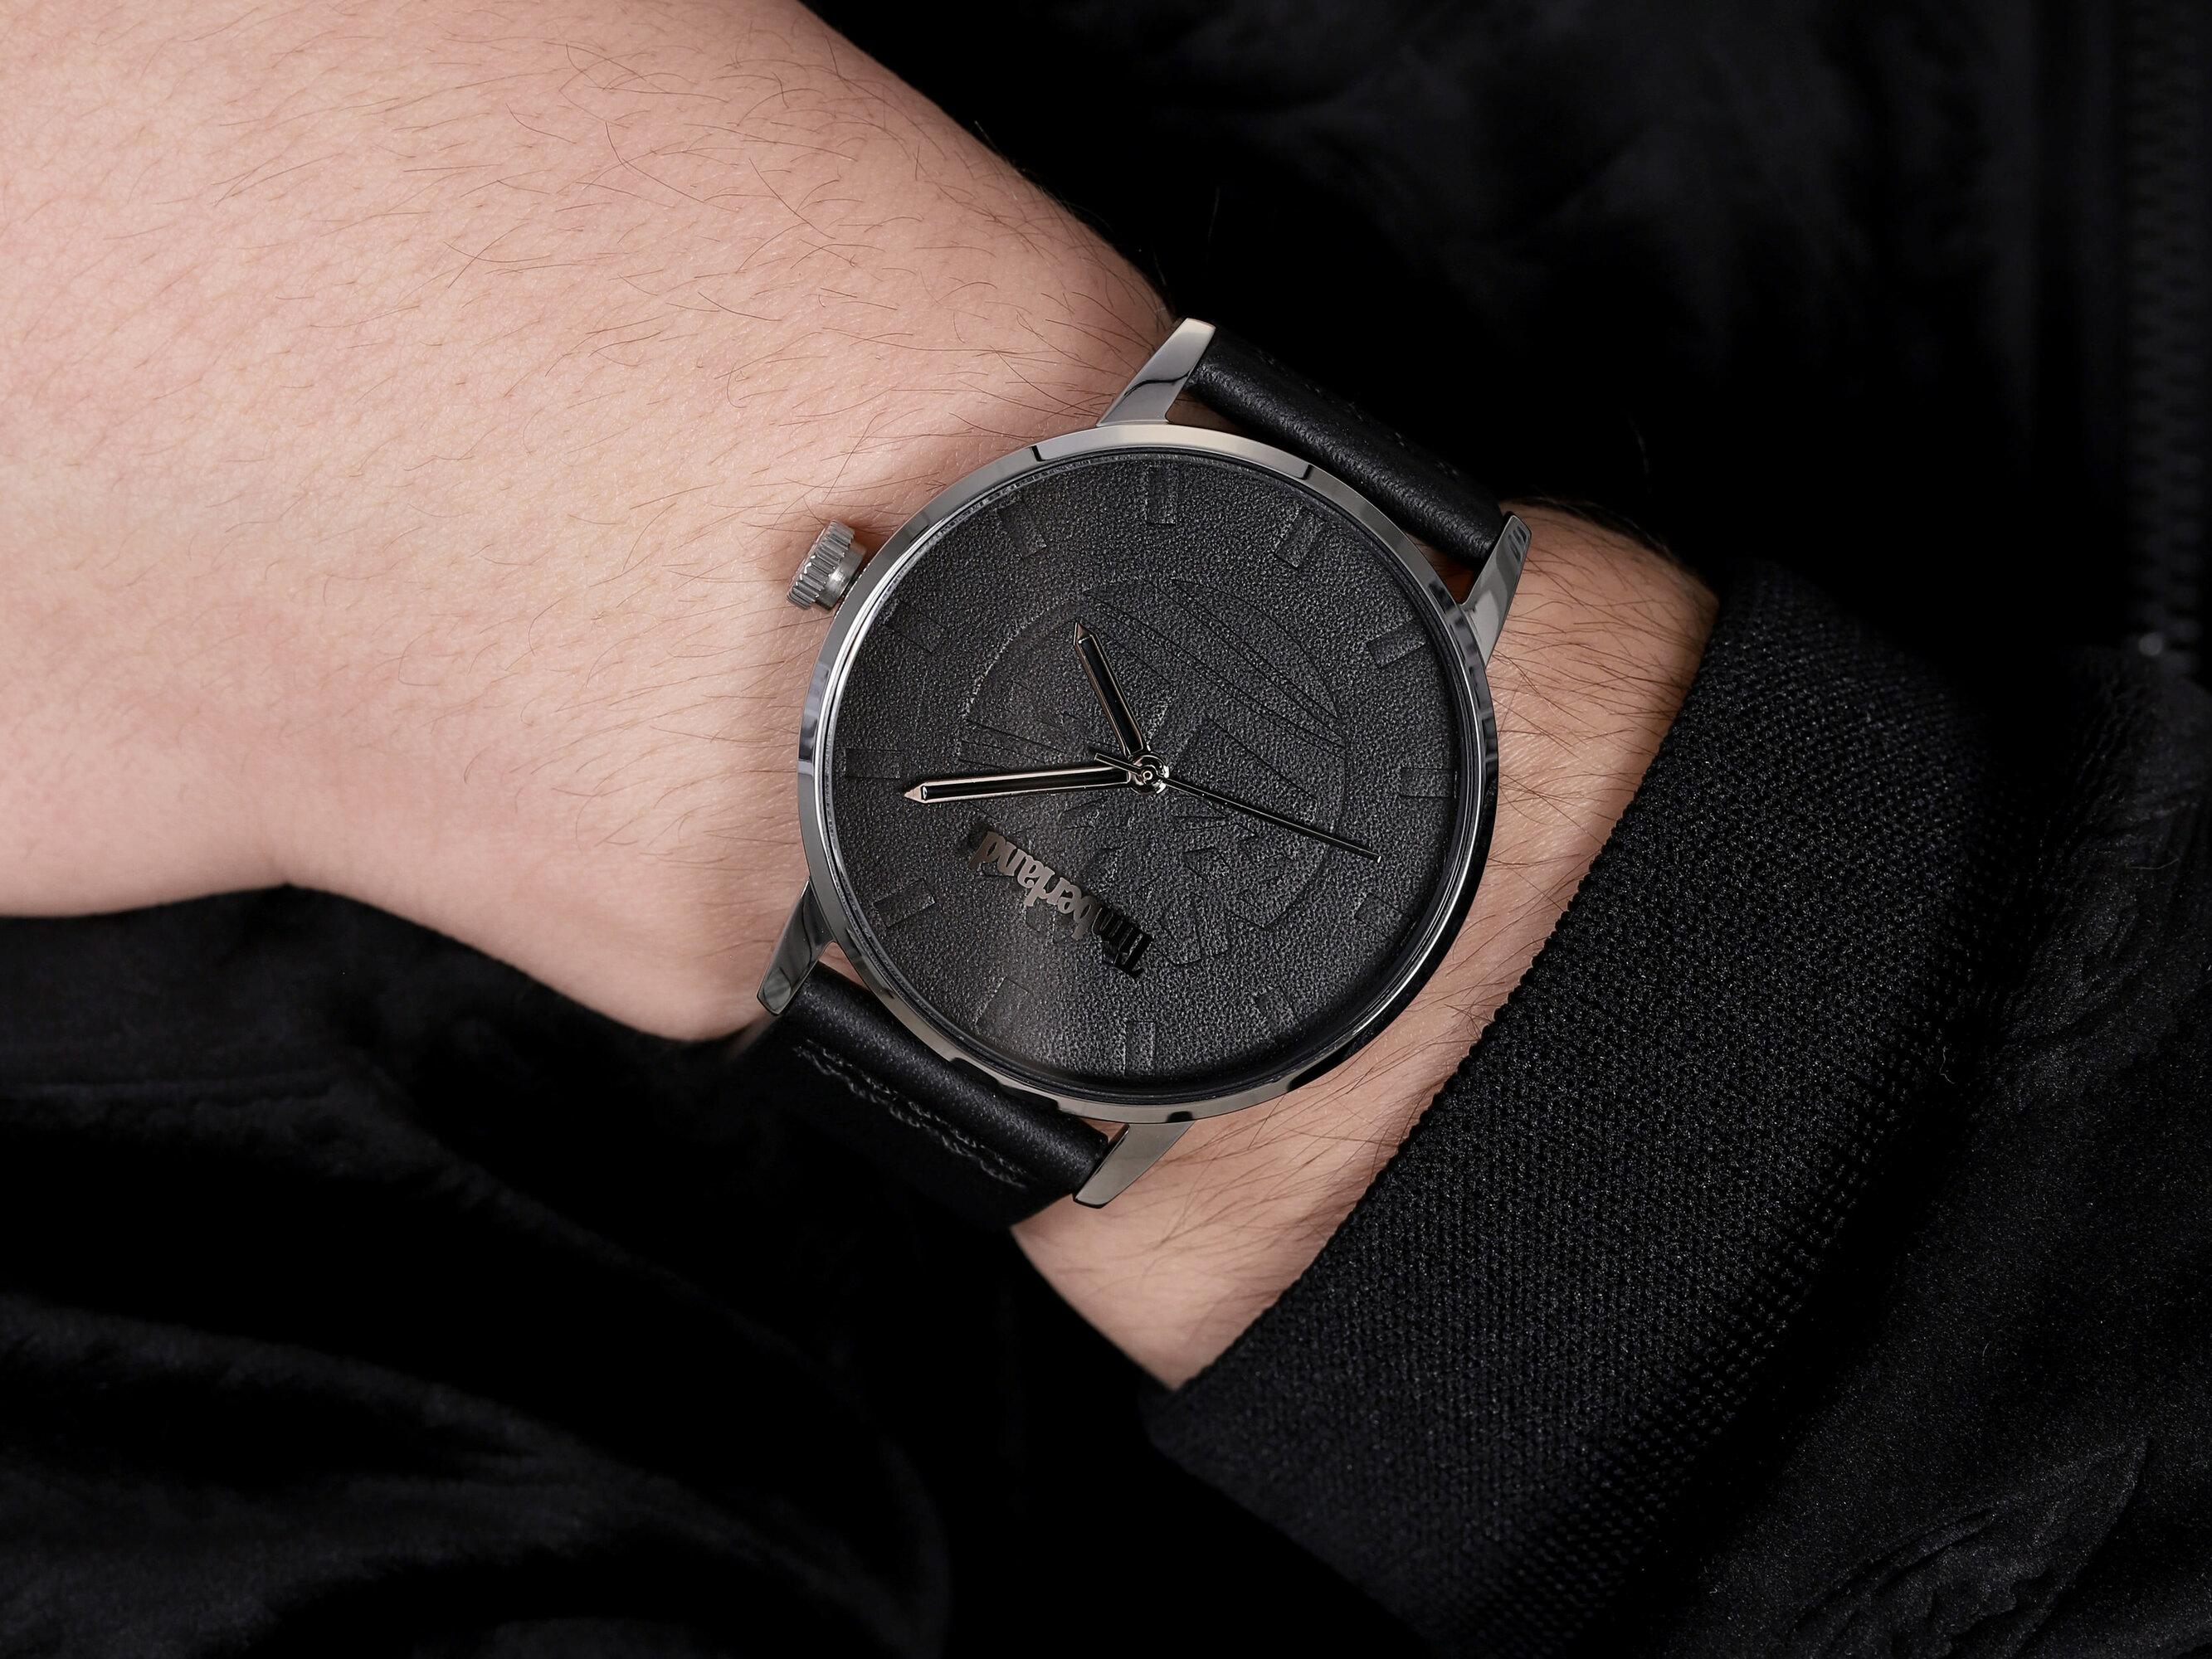 Timberland TBL.TDWJA2000802 męski zegarek Raycroft pasek